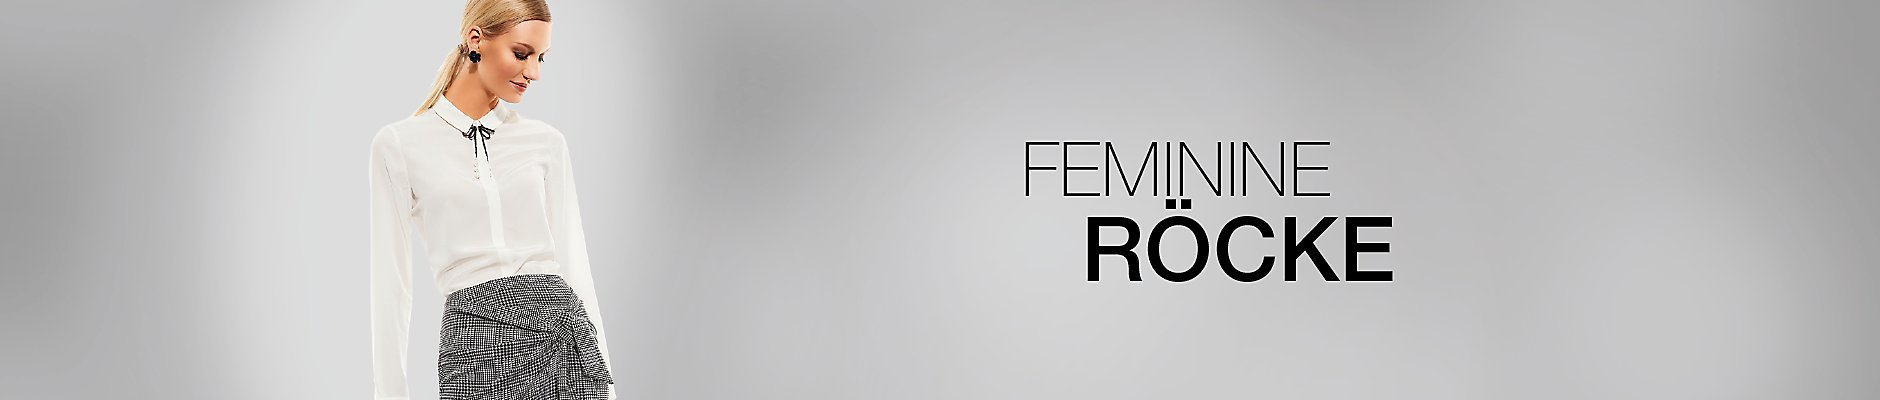 Feminine Röcke